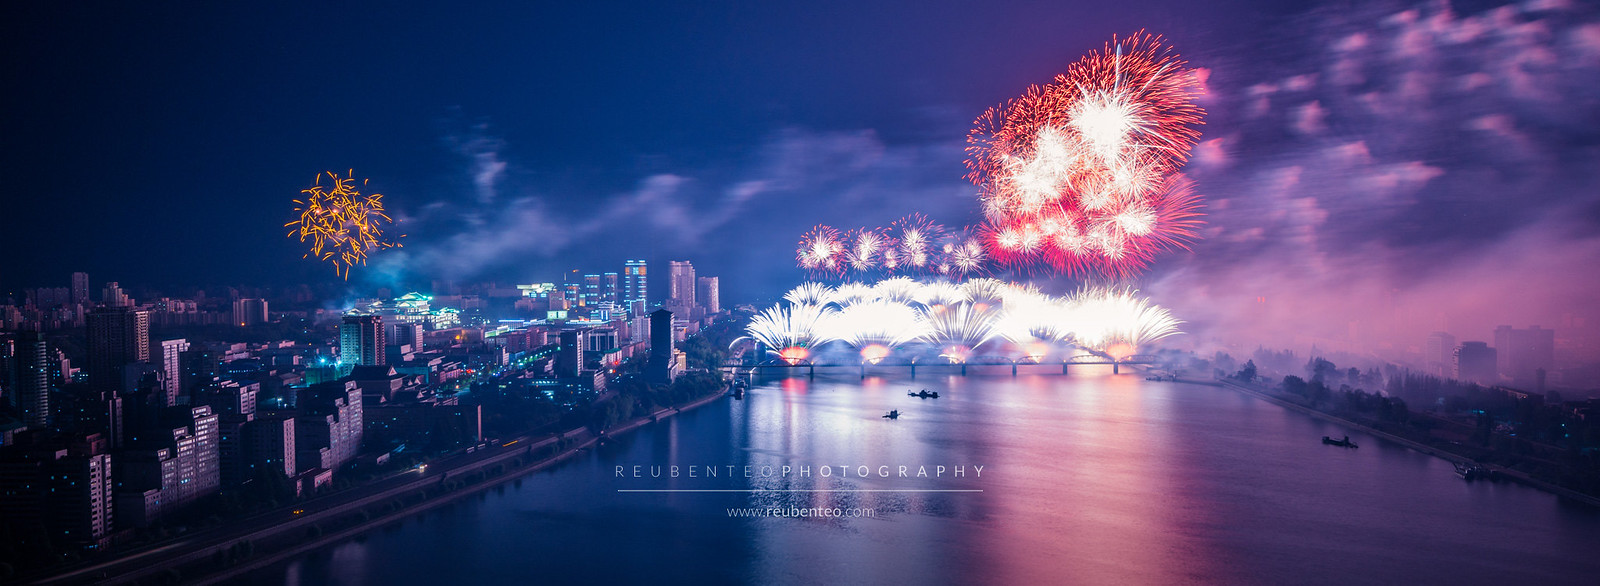 Pyongyang City Fireworks